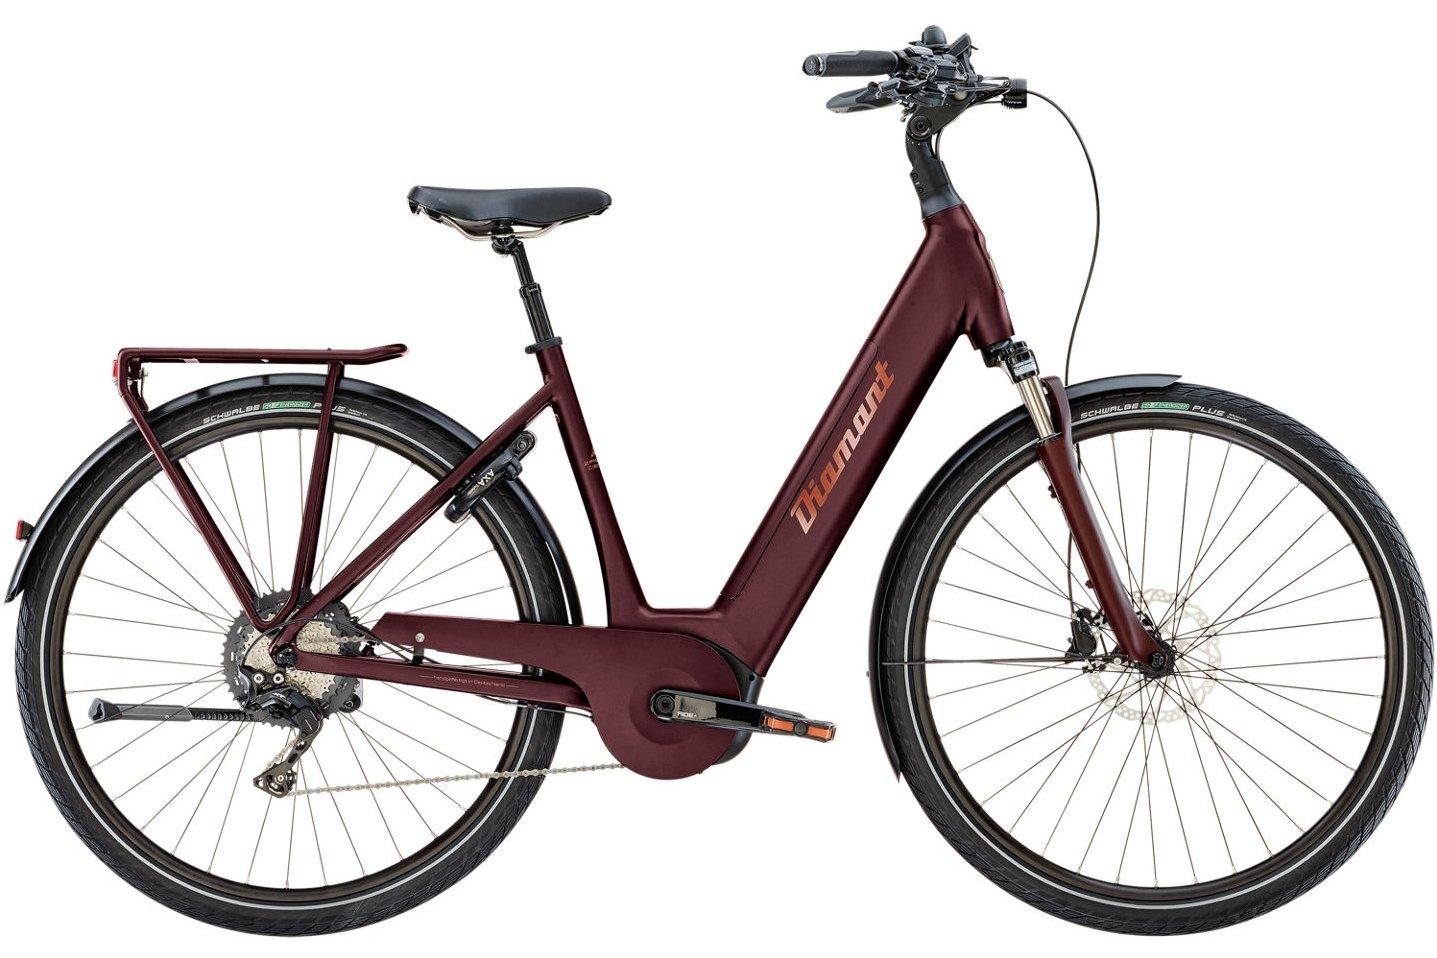 Diamant e-Bike Zagora+ Deluxe 2019 mit 20% Rabatt für 2799€ inkl. Versand [jehlebikes.de]